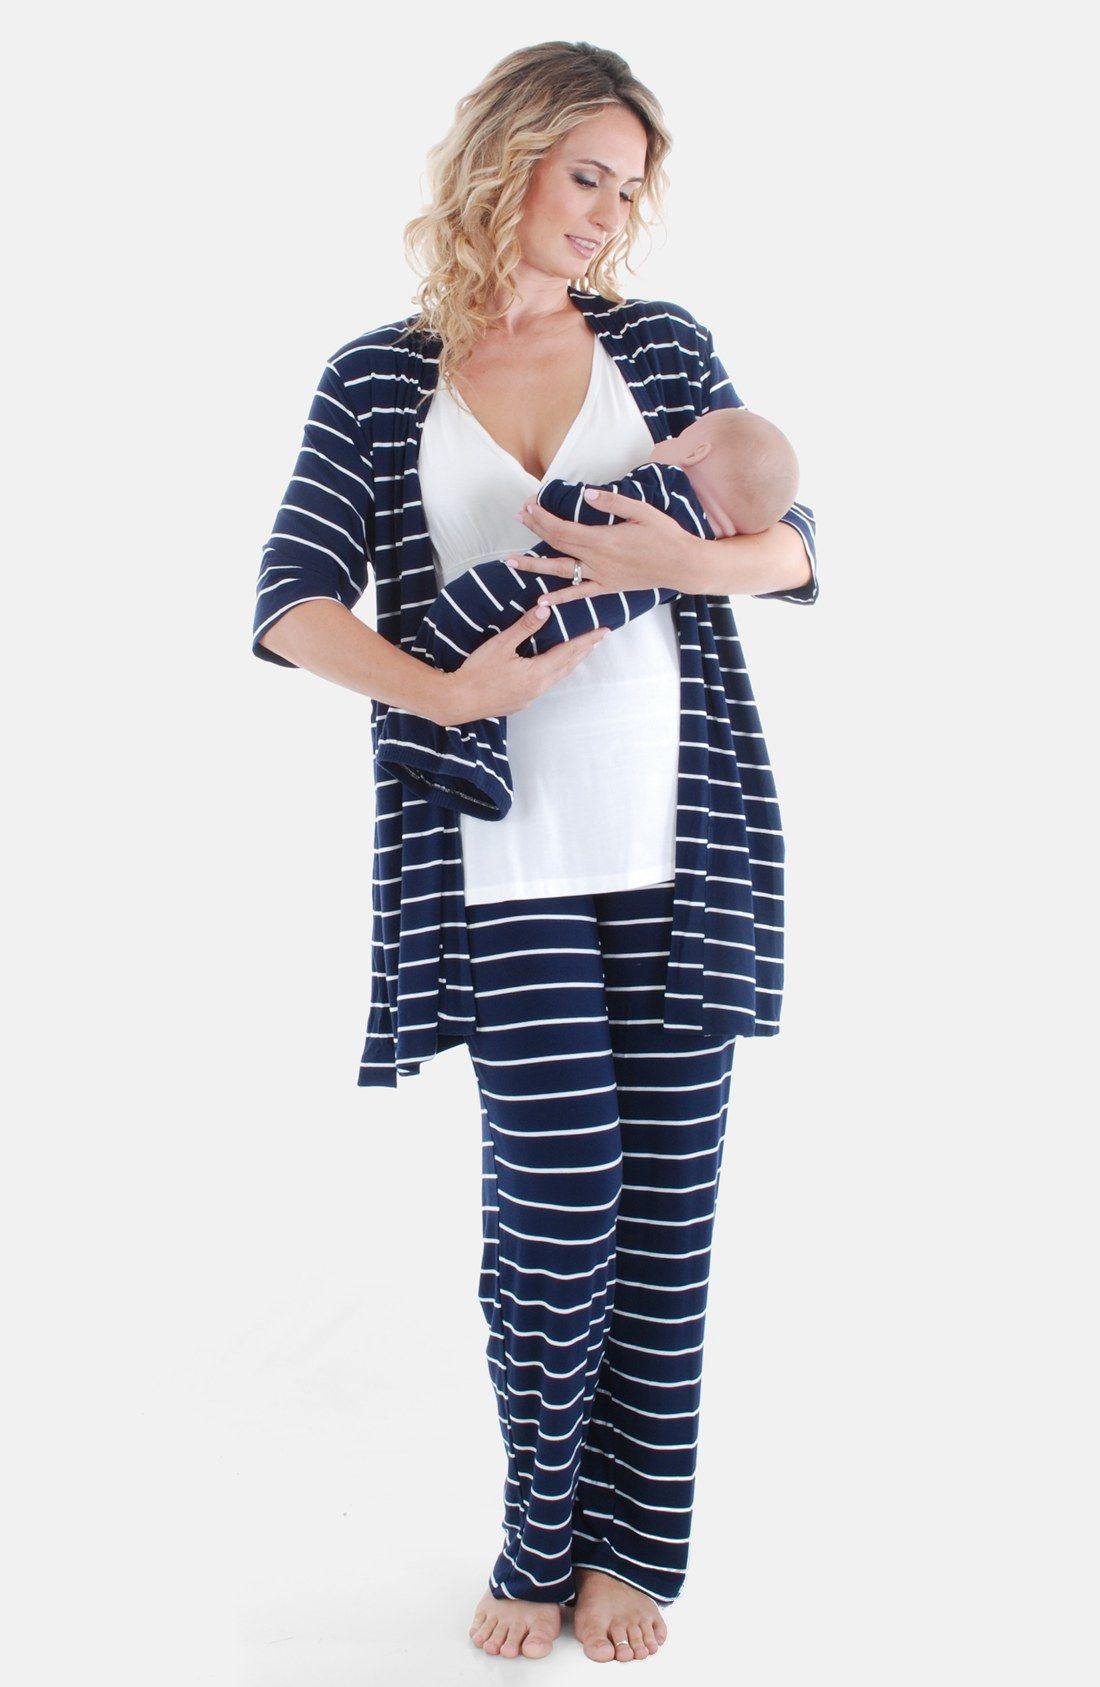 b12d4af52ac Everly Grey  Roxanne - During   After  4-Piece Maternity Sleepwear ...